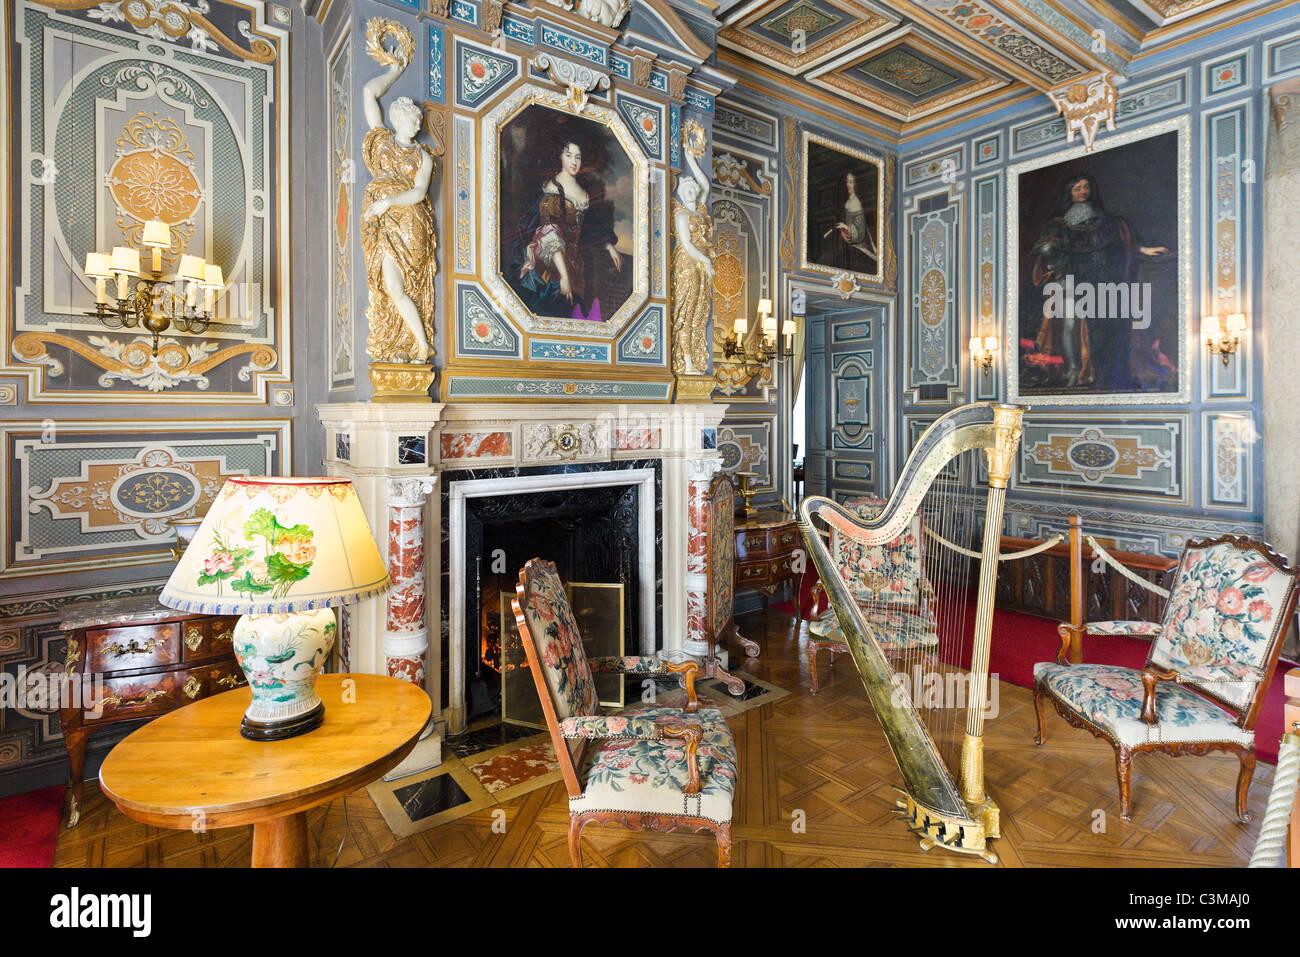 The Grand Salon, Chateau de Cheverny, Loire Valley, Touraine, France - Stock Image